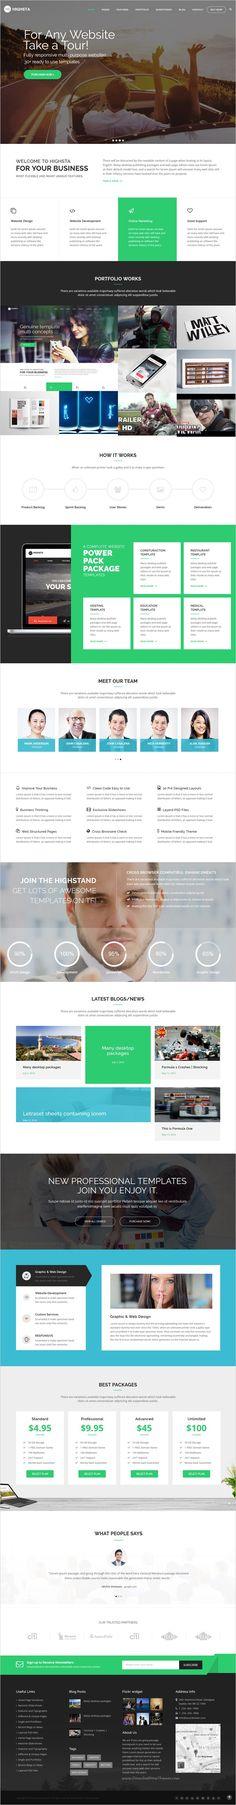 Minimal - The Final Minimal Solution Drupal 8 Drupal and Minimal - personal resume websites